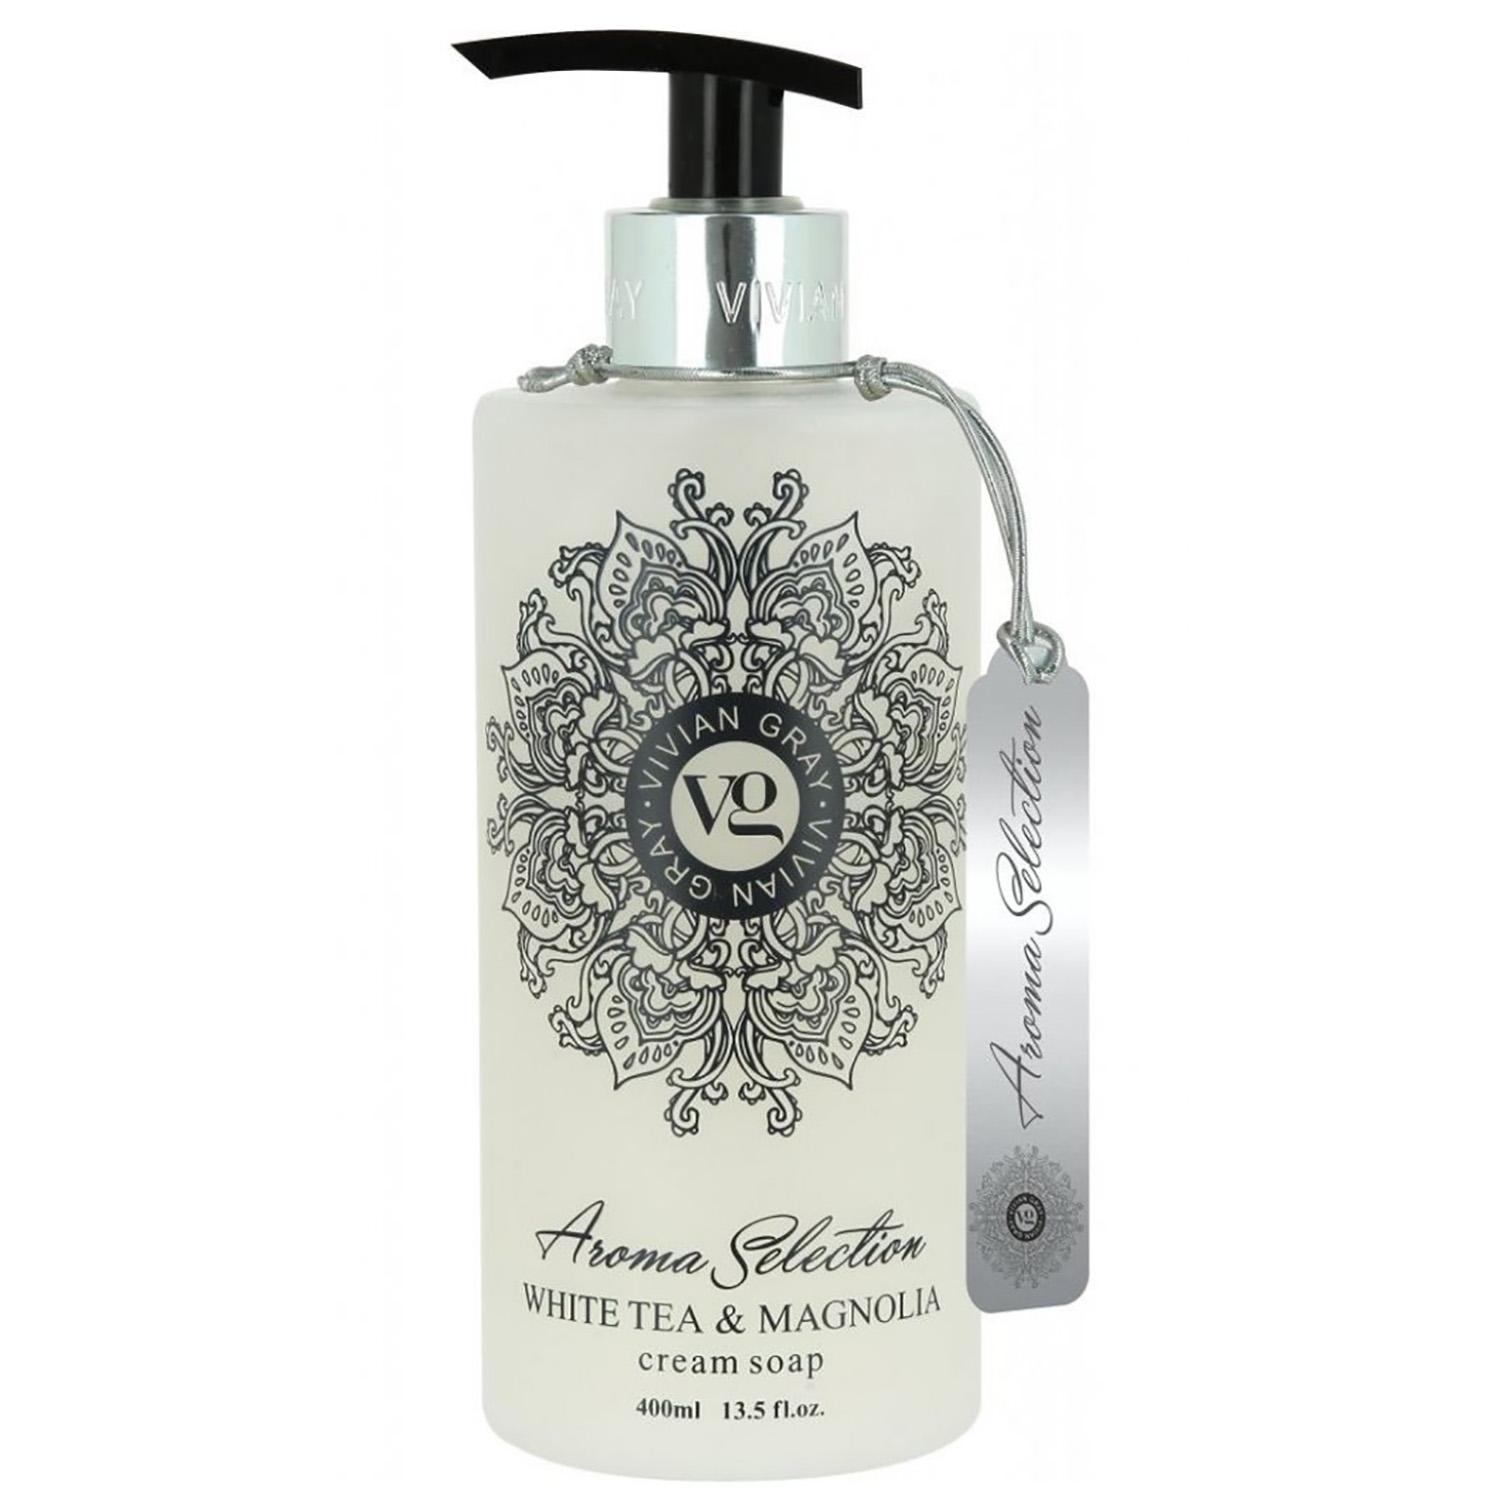 Tekuté mýdlo White Tea a Magnolia - Vivian Gray, Provence - zvìtšit obrázek